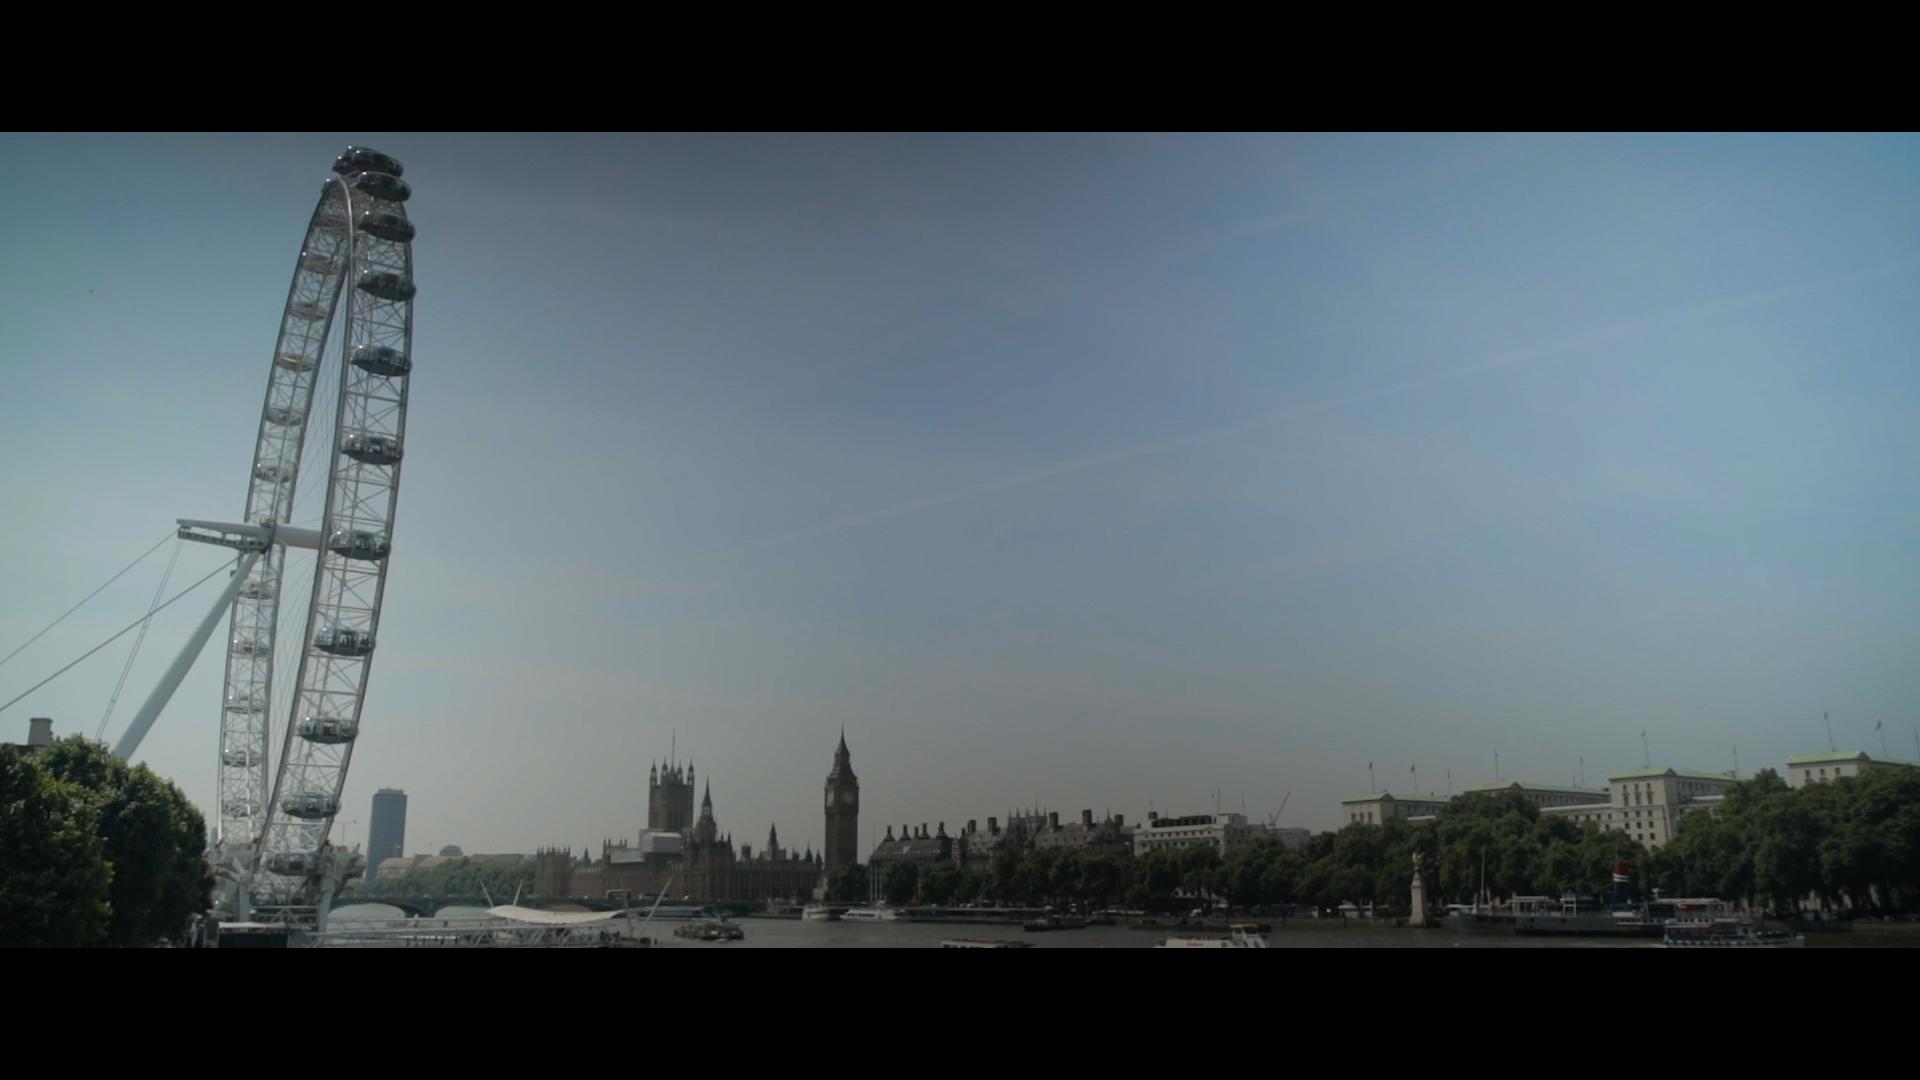 London_wheel.jpg